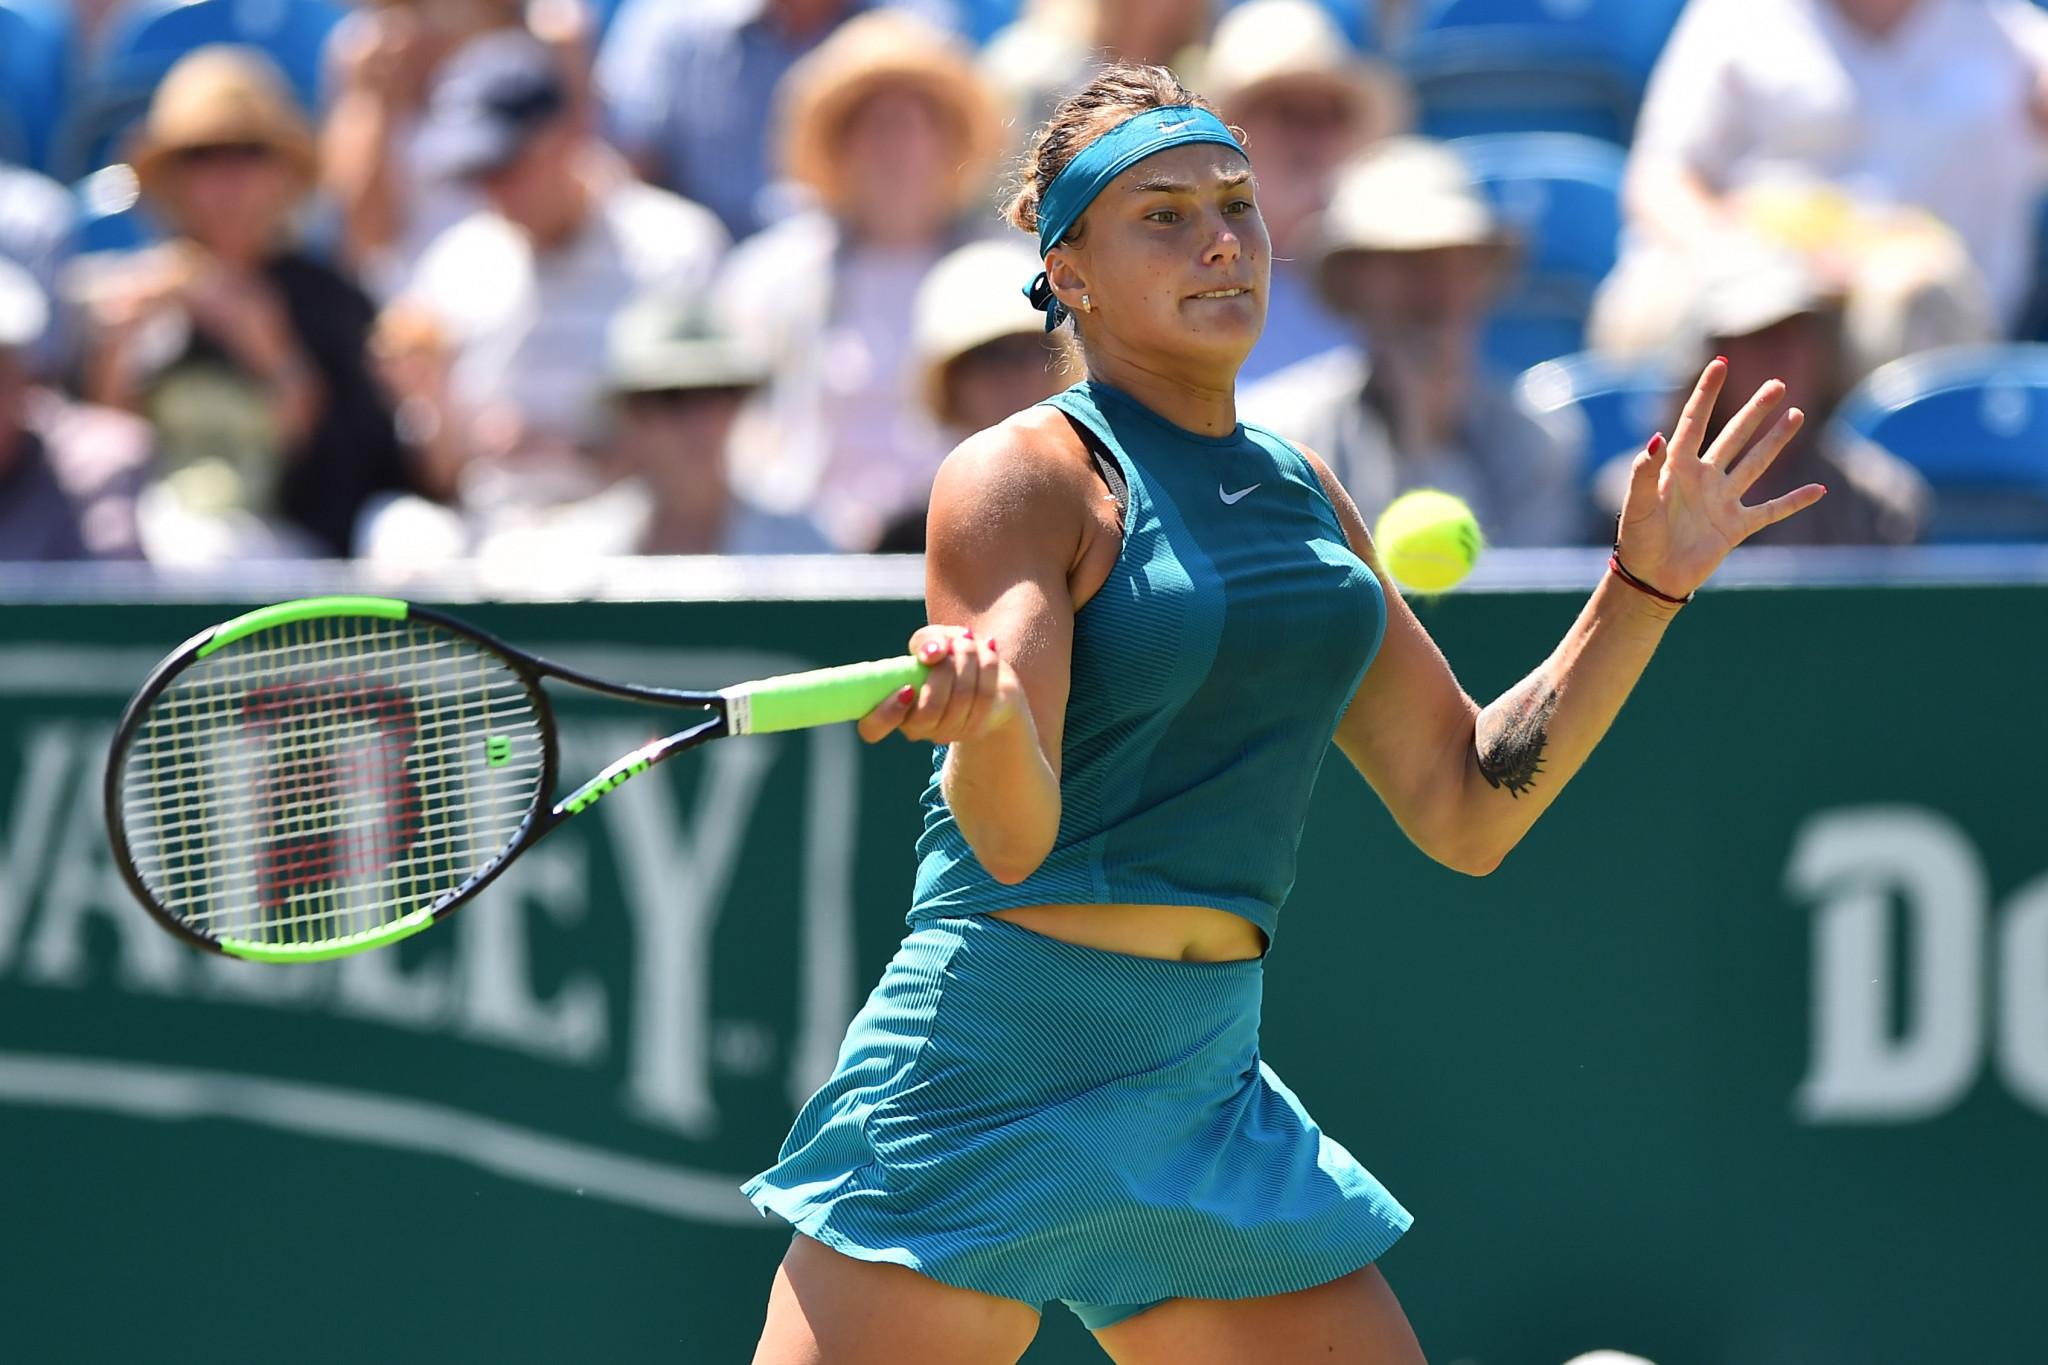 Sabalenka stuns defending champion Plíšková to reach semi-finals at WTA Eastbourne International